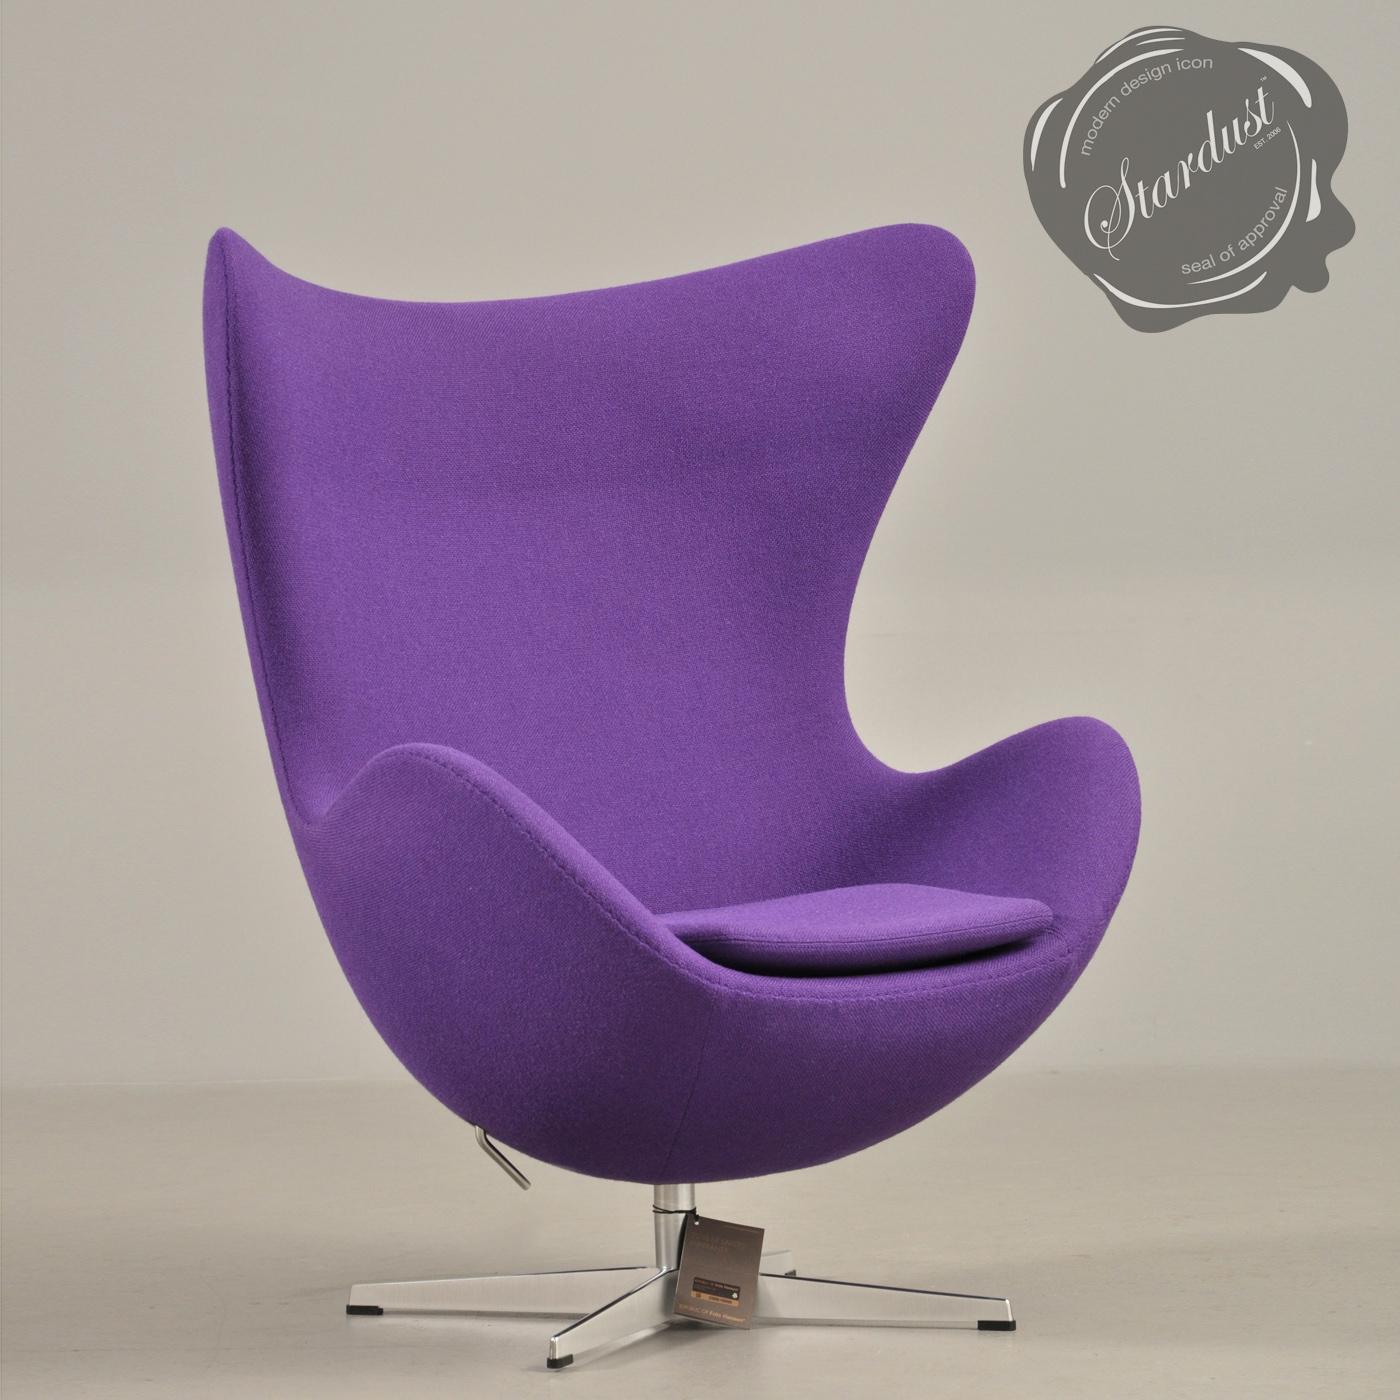 original arne egg fritz modern hansen jacobsen chair. Black Bedroom Furniture Sets. Home Design Ideas